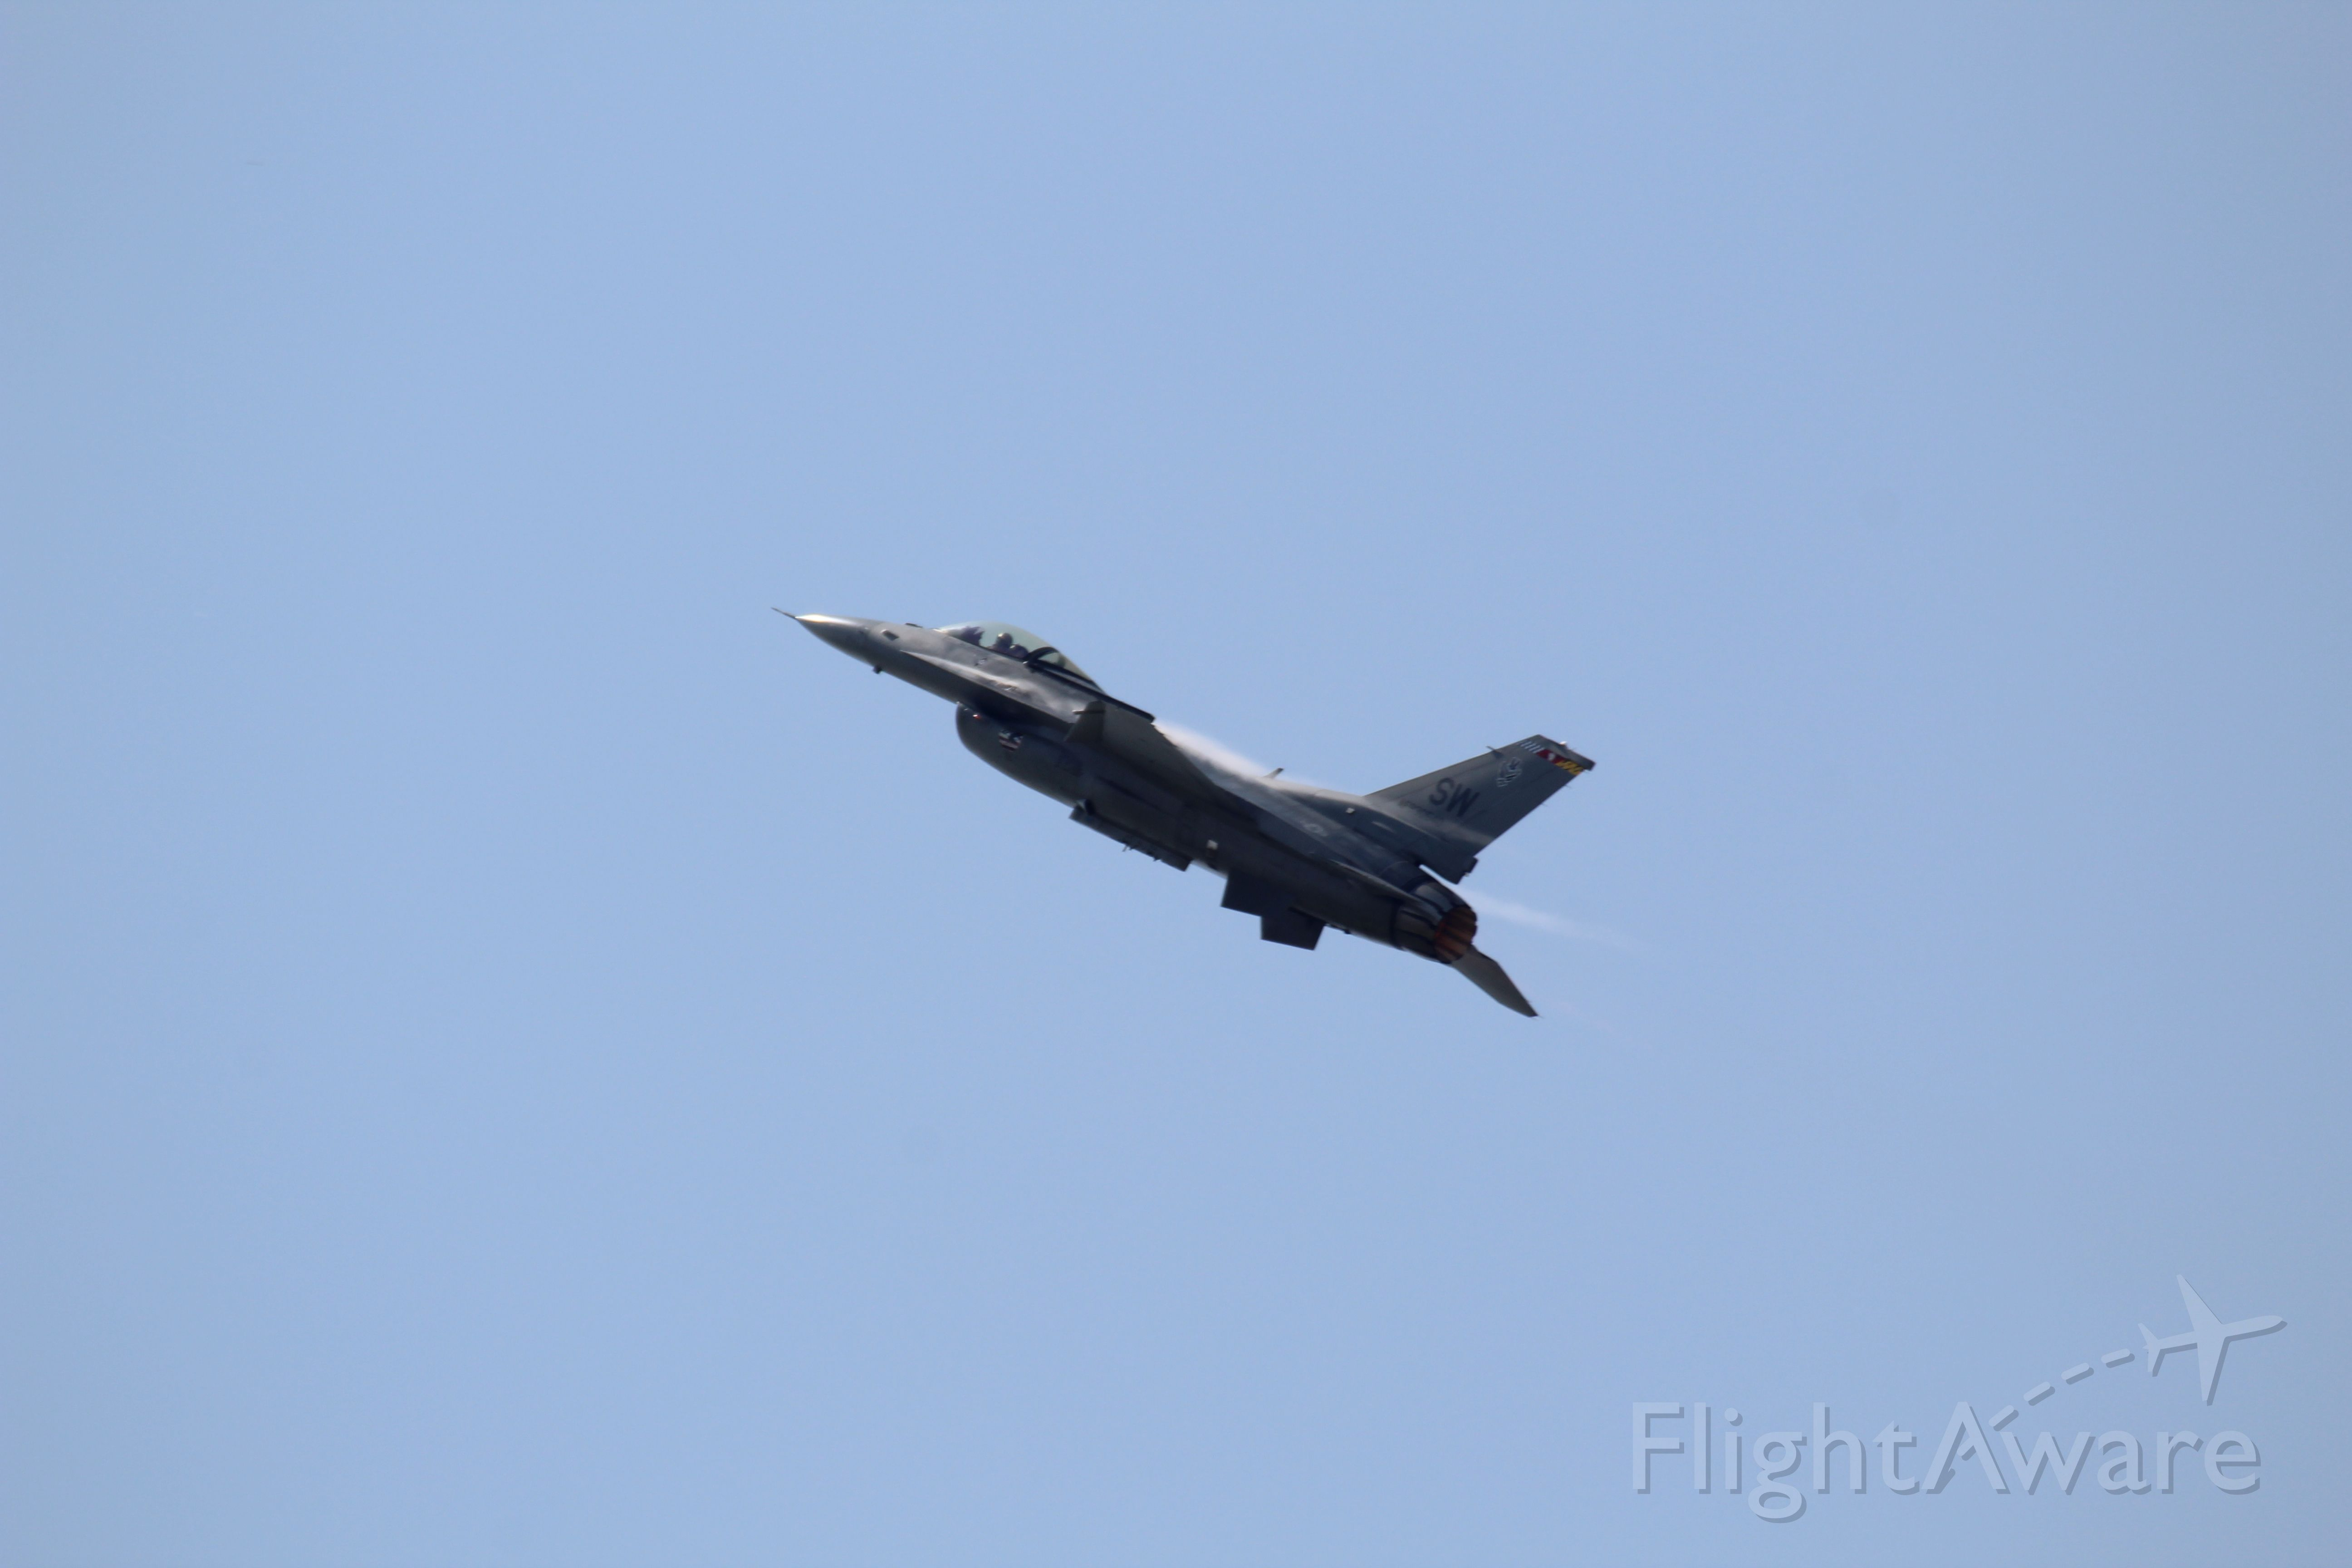 Lockheed F-16 Fighting Falcon (93-0540)